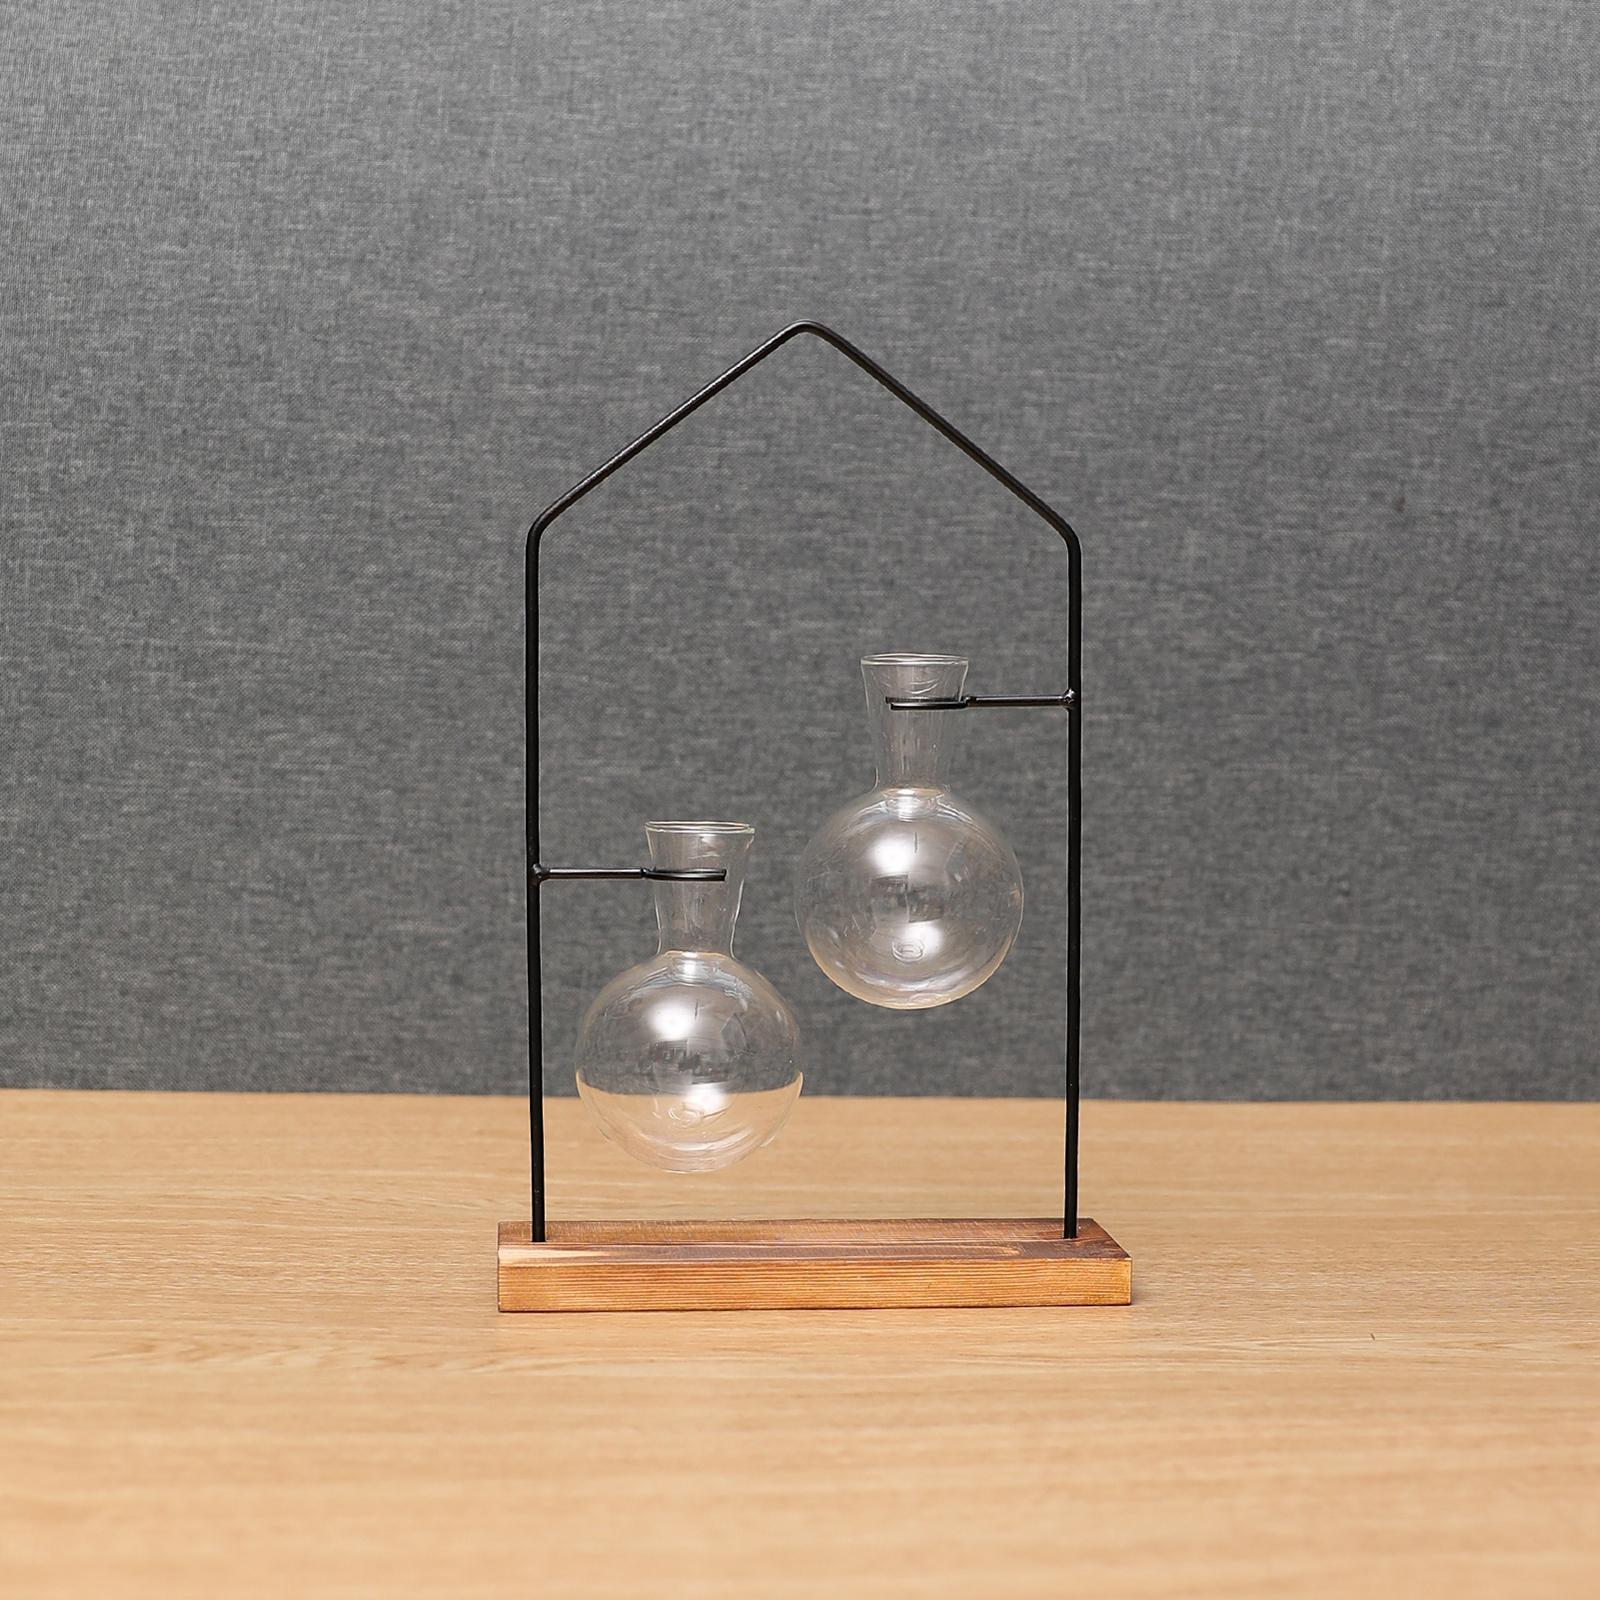 thumbnail 7 - Hydroponic Bonsai Plant Glass Vase Flower Pot Wood Stand Desk Decor